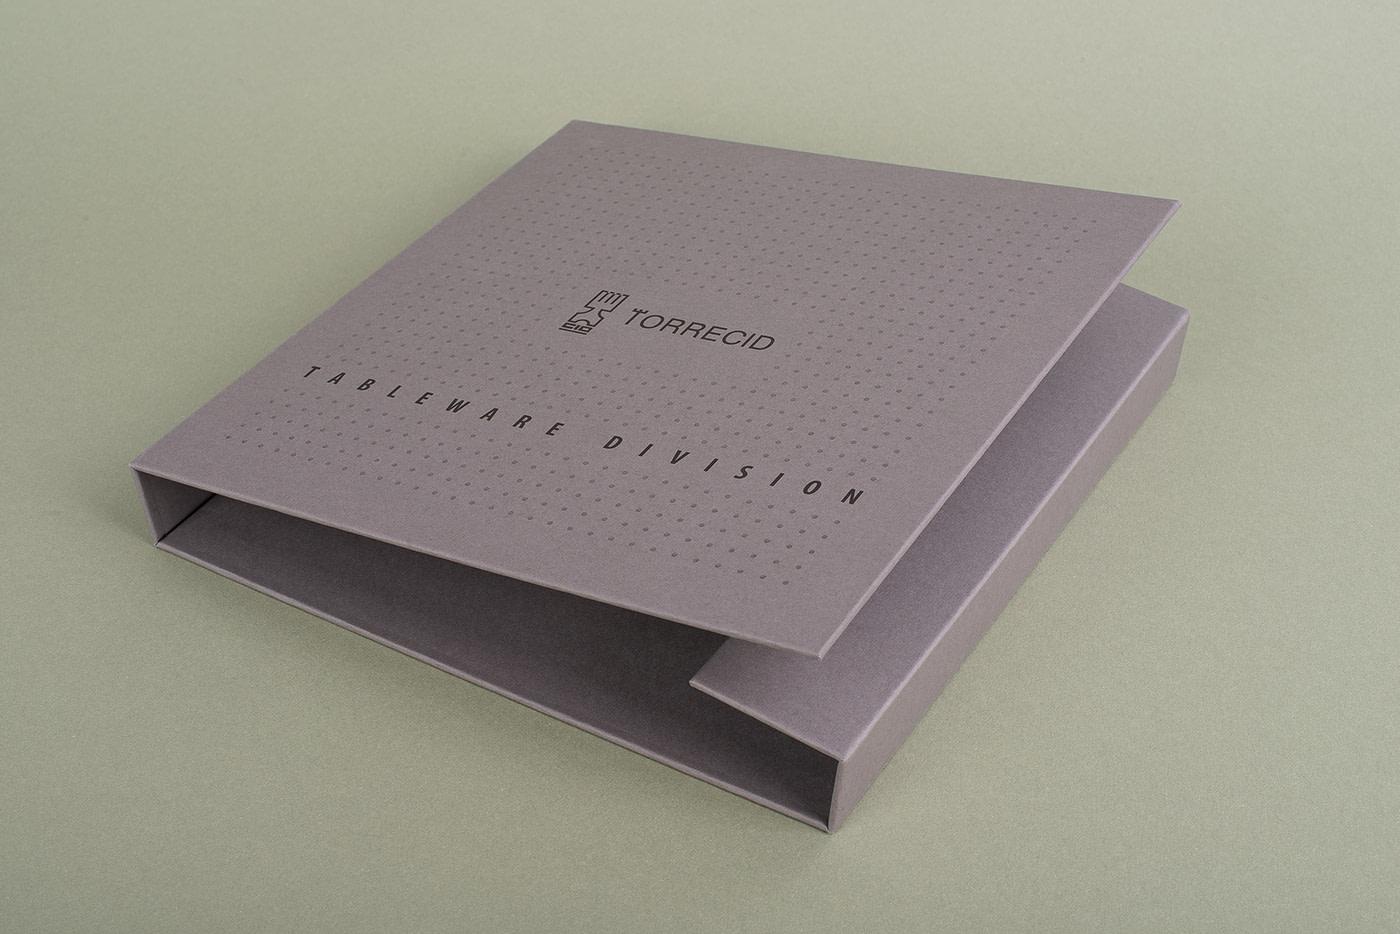 Carpeta - Torrecid Tableware Division